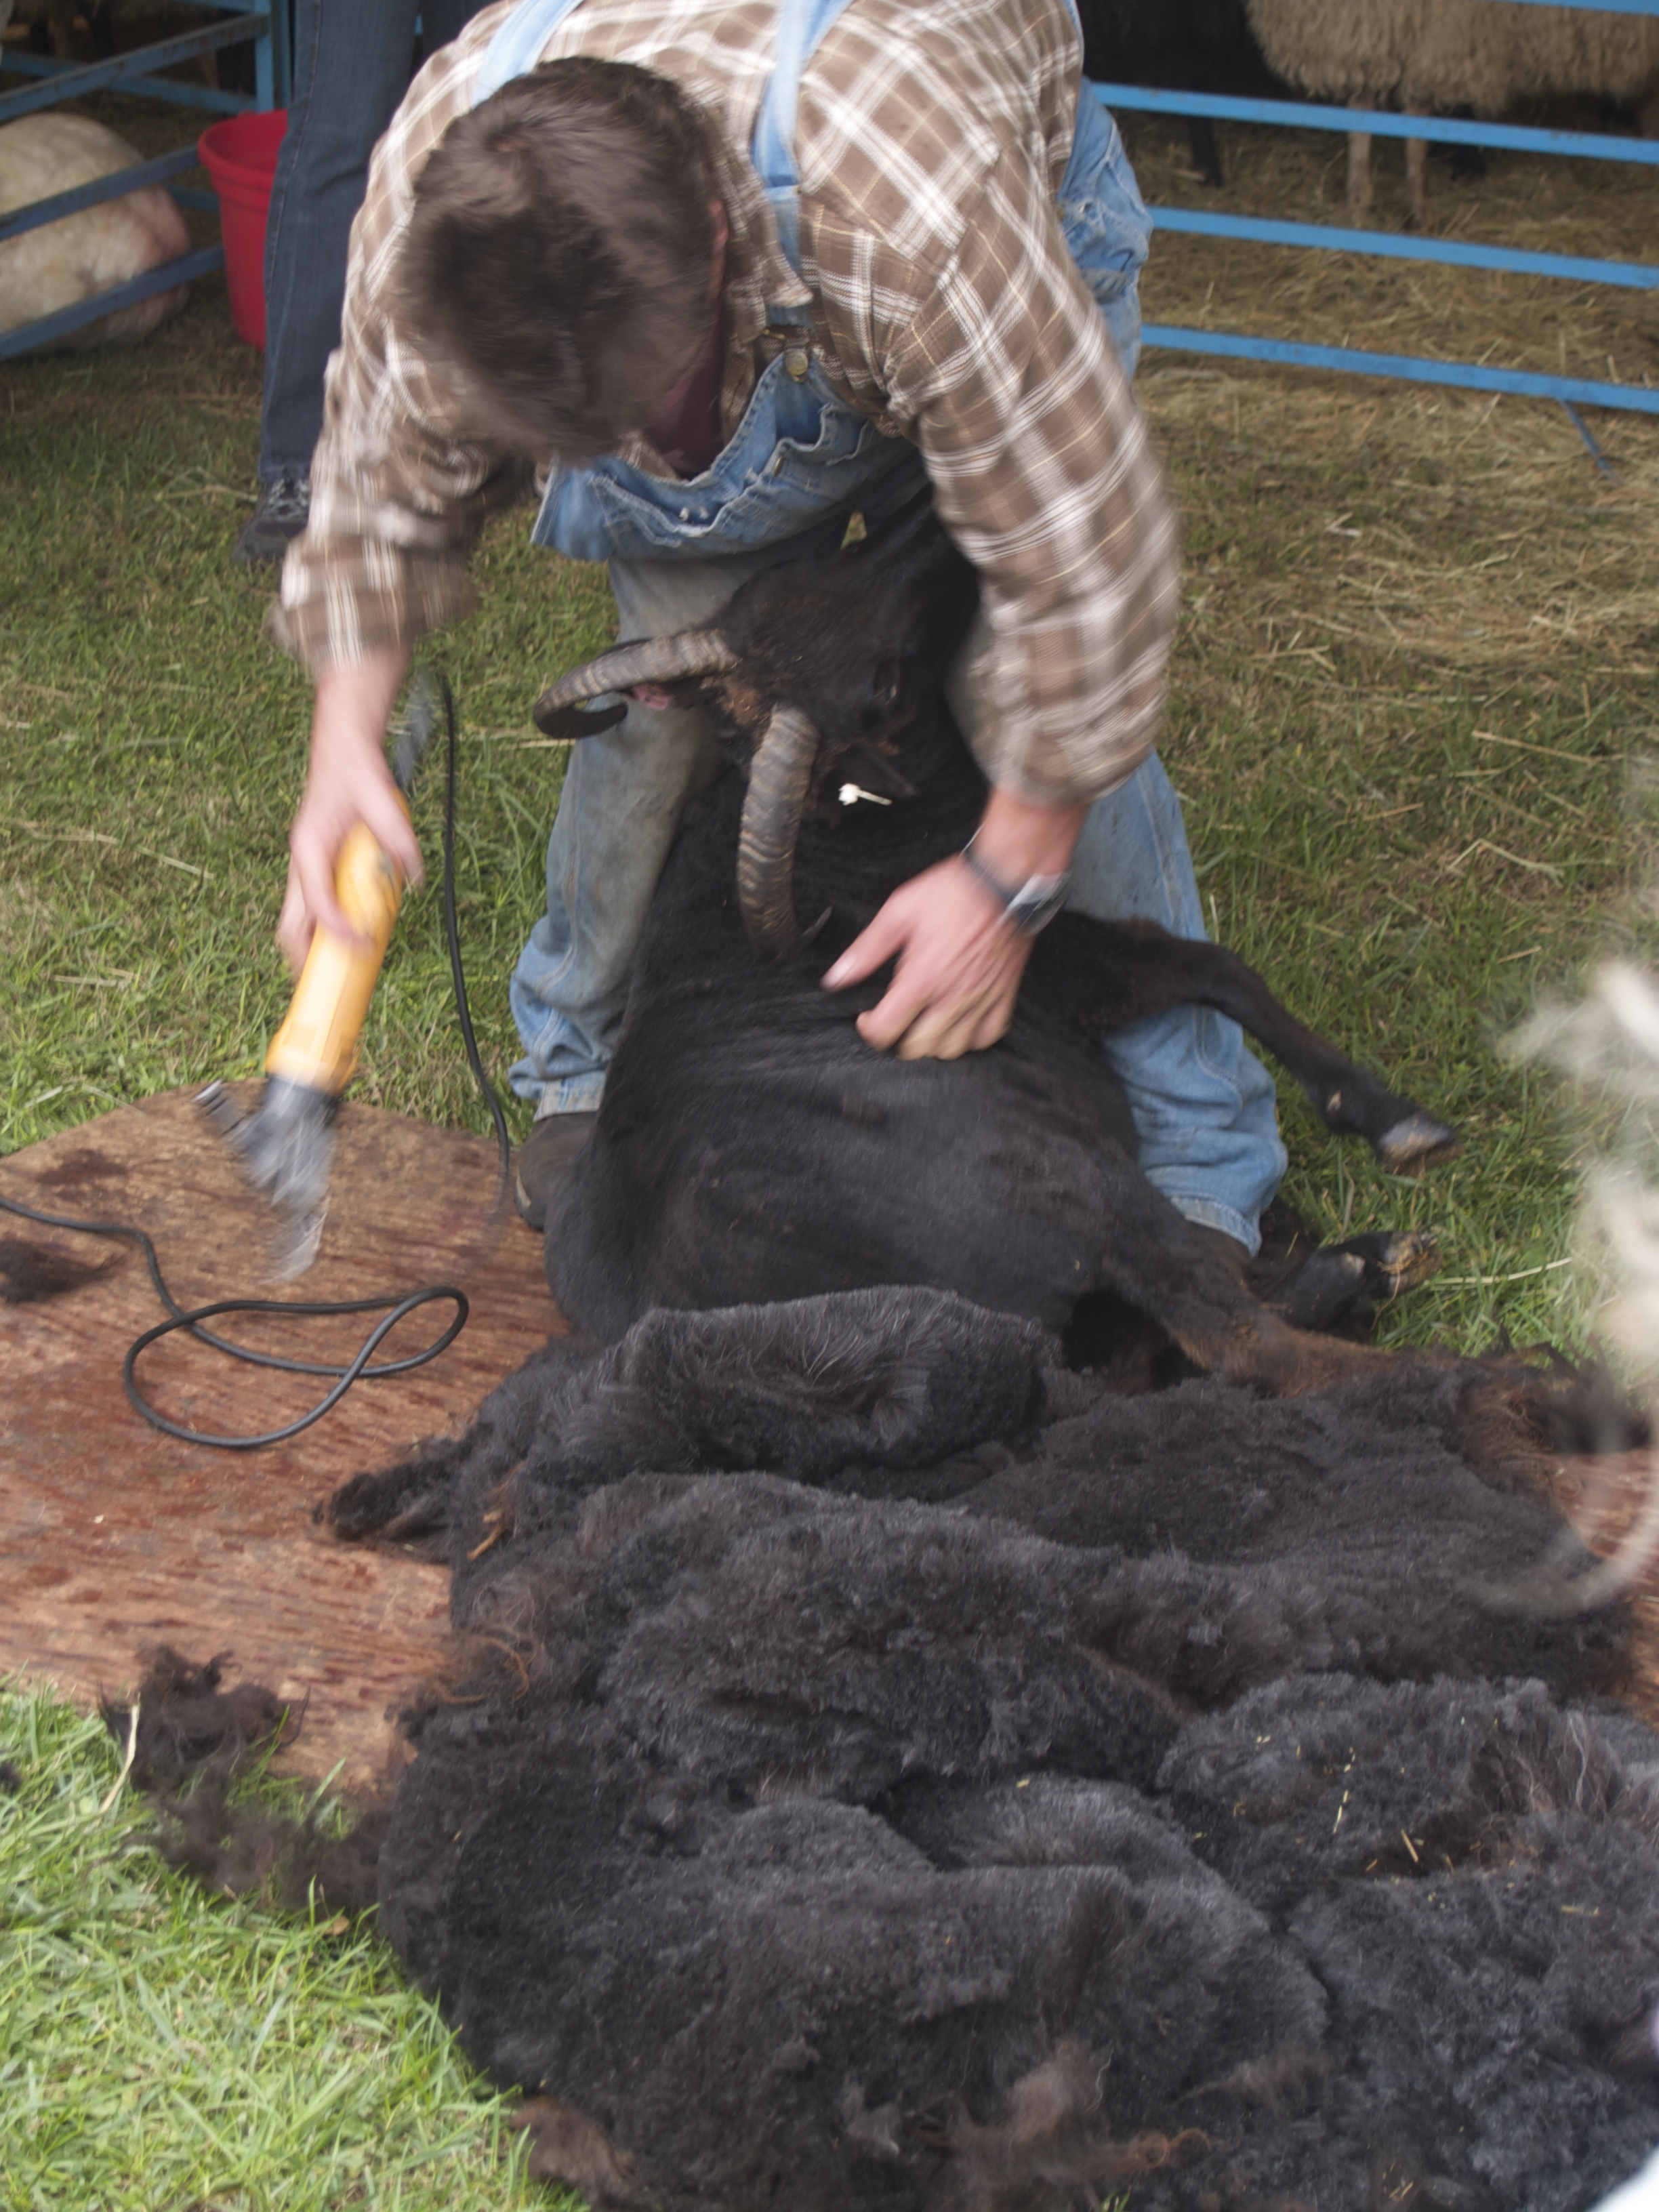 Where all wool begins: the sheep shearing